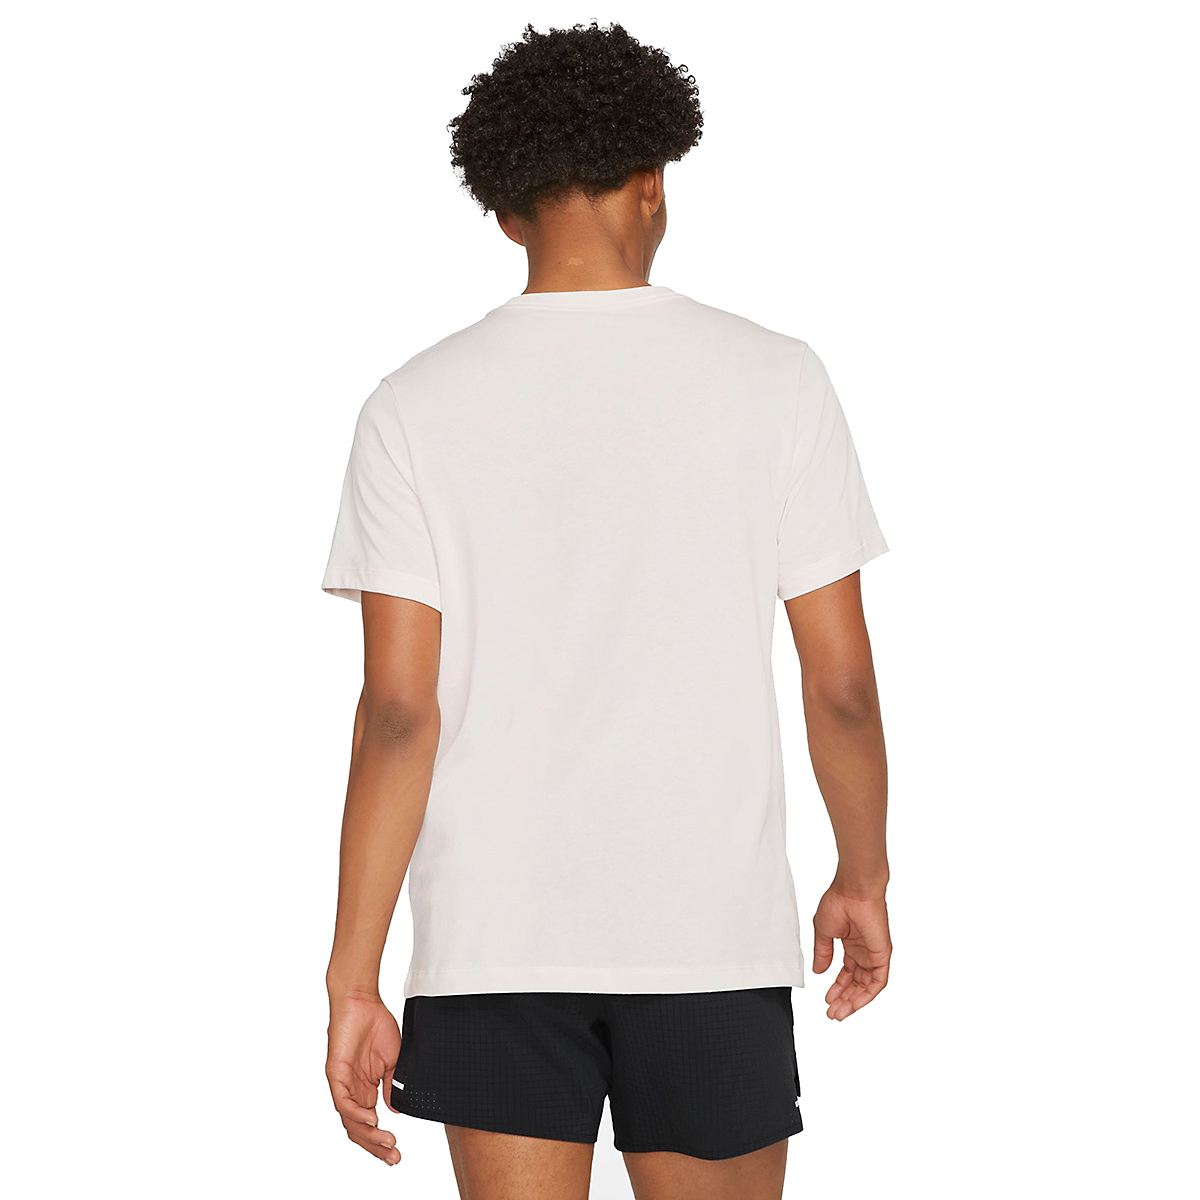 Men's Nike Dri-FIT Short Sleeve Trail Running T-Shirt - Color: Light Soft Pink - Size: XS, Light Soft Pink, large, image 2